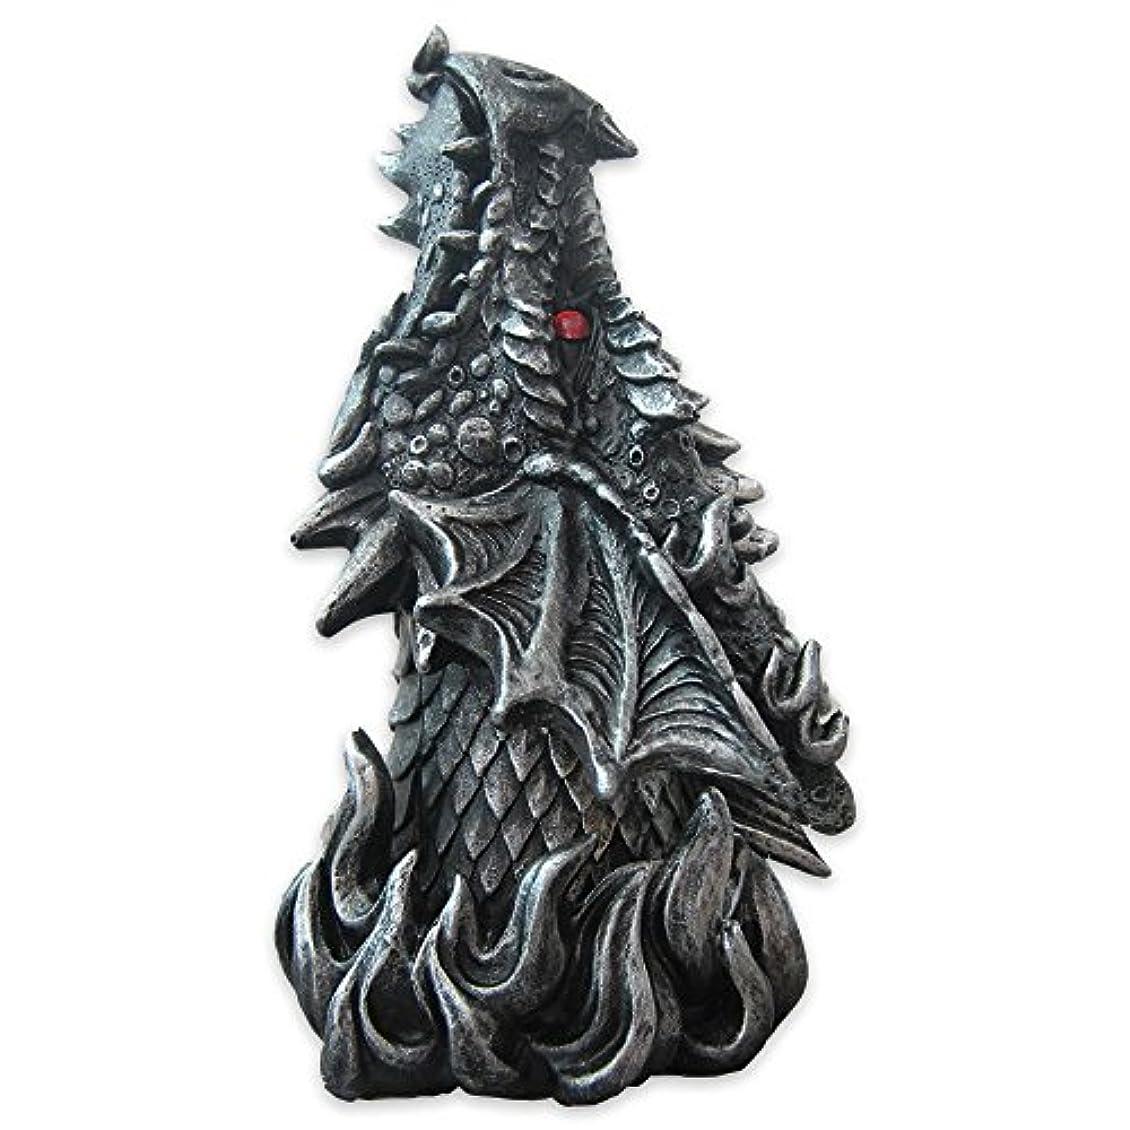 枯渇幾分活性化Dragon Figure Cone Incense Burner Fiery Eyes - Gothic Smoke Breathing Decor